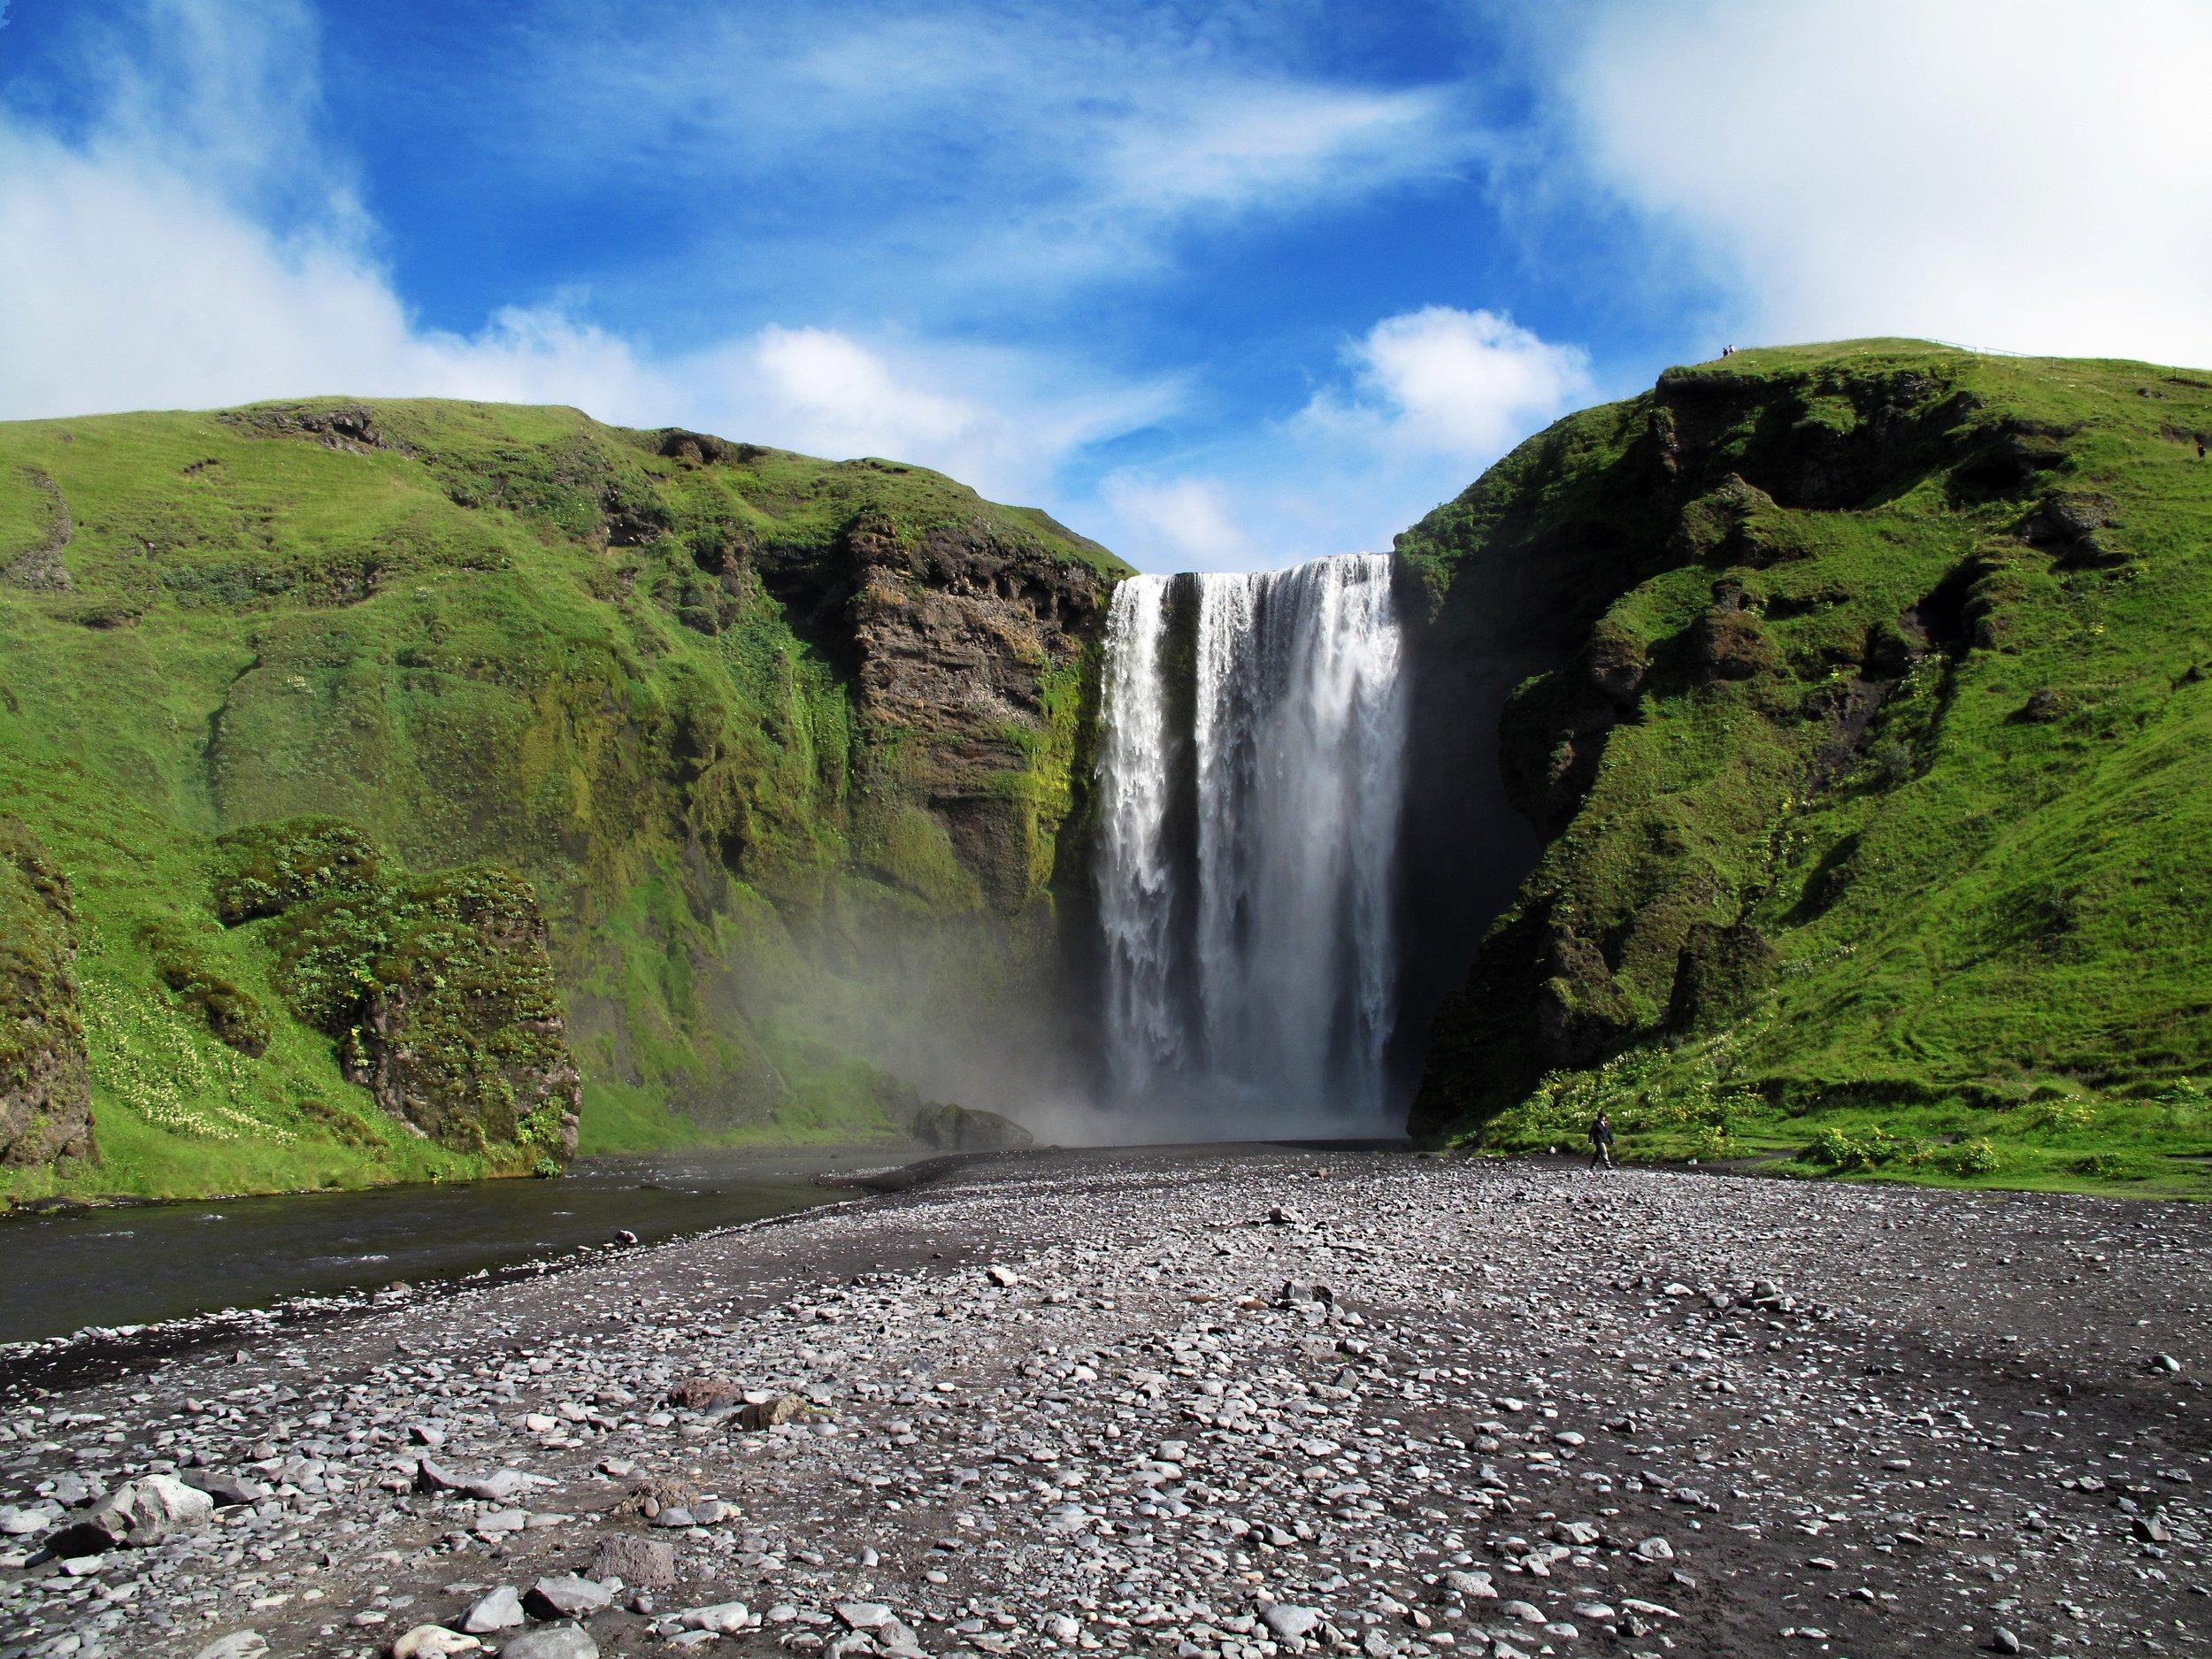 #4 - Skógafoss Waterfall